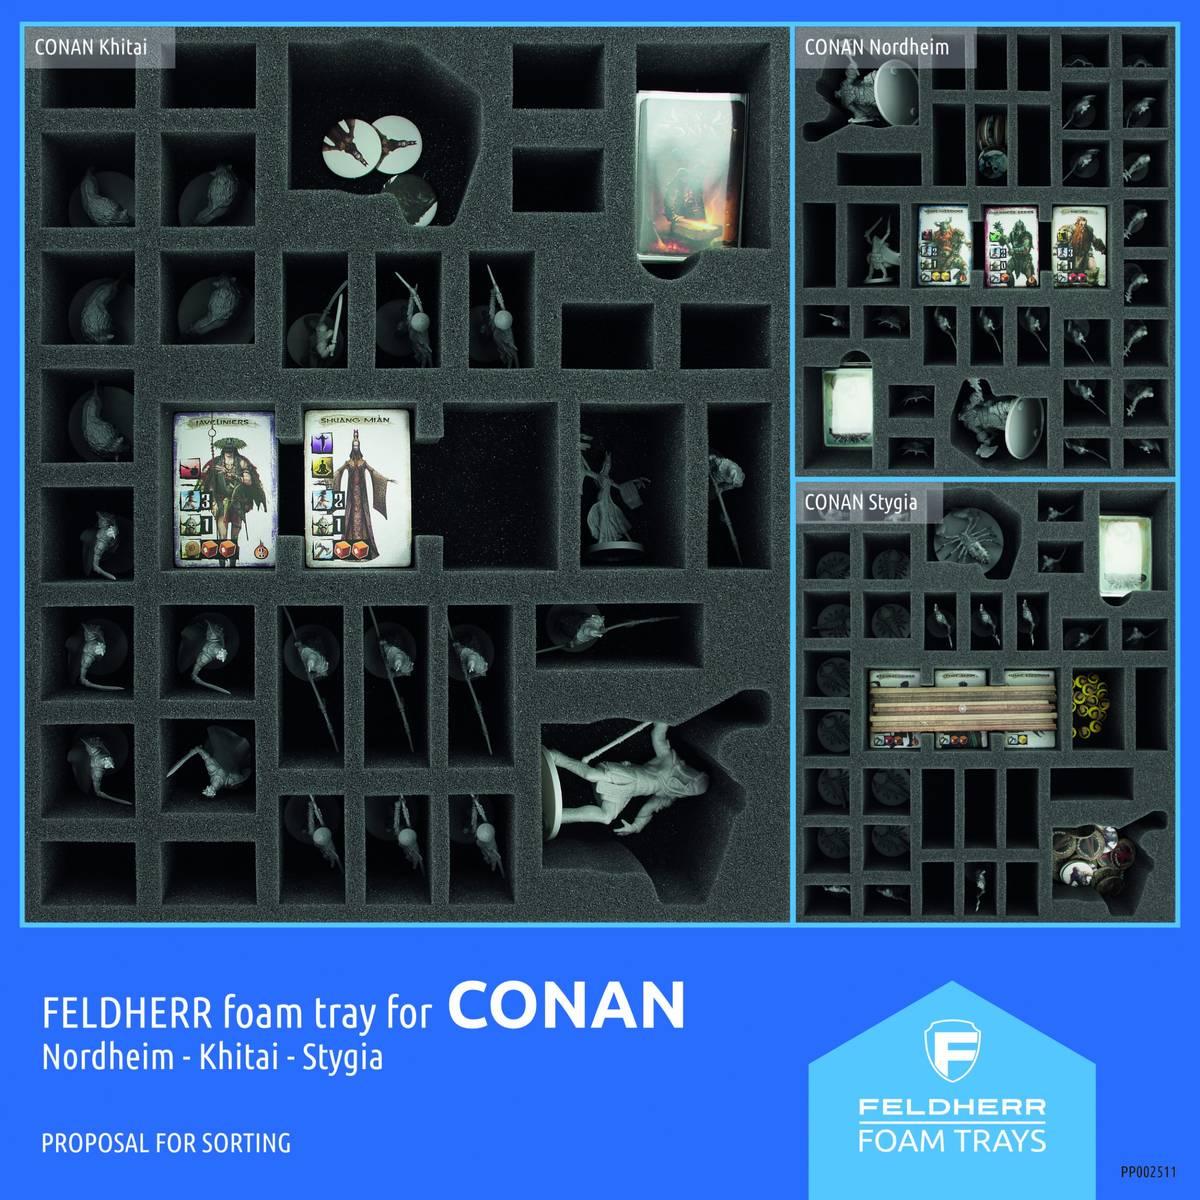 PP002511 - Flyer for Conan: Khitai/ Nordheim/ Stygia